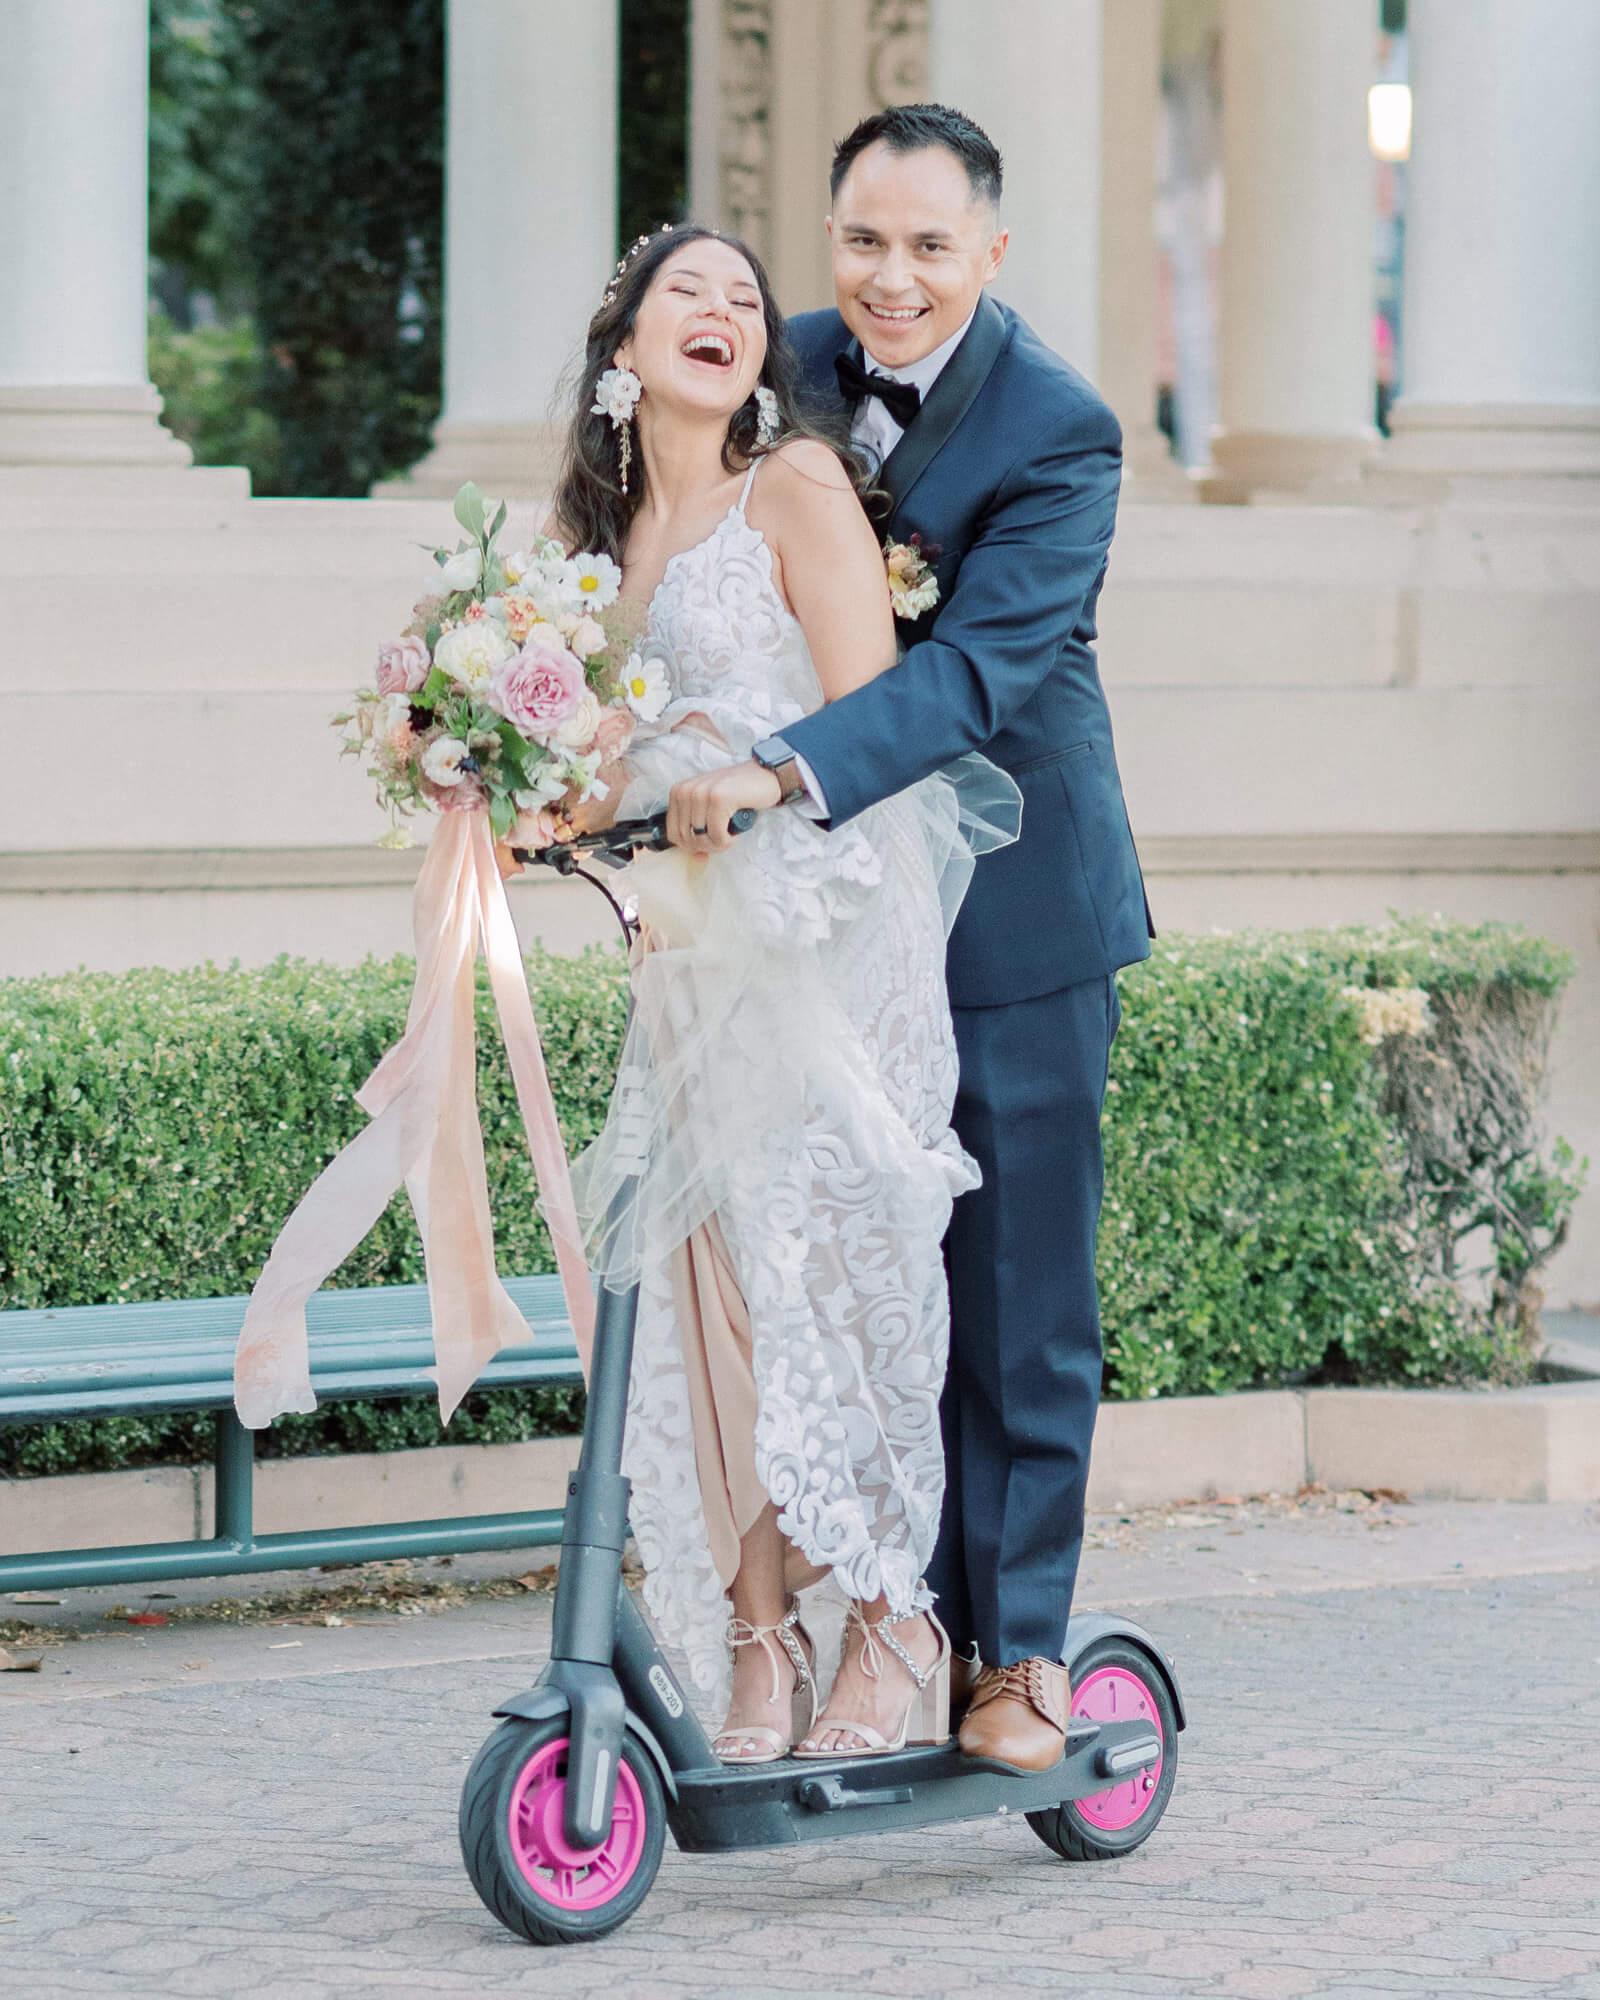 Congratulations to the couple - Calista & Ian